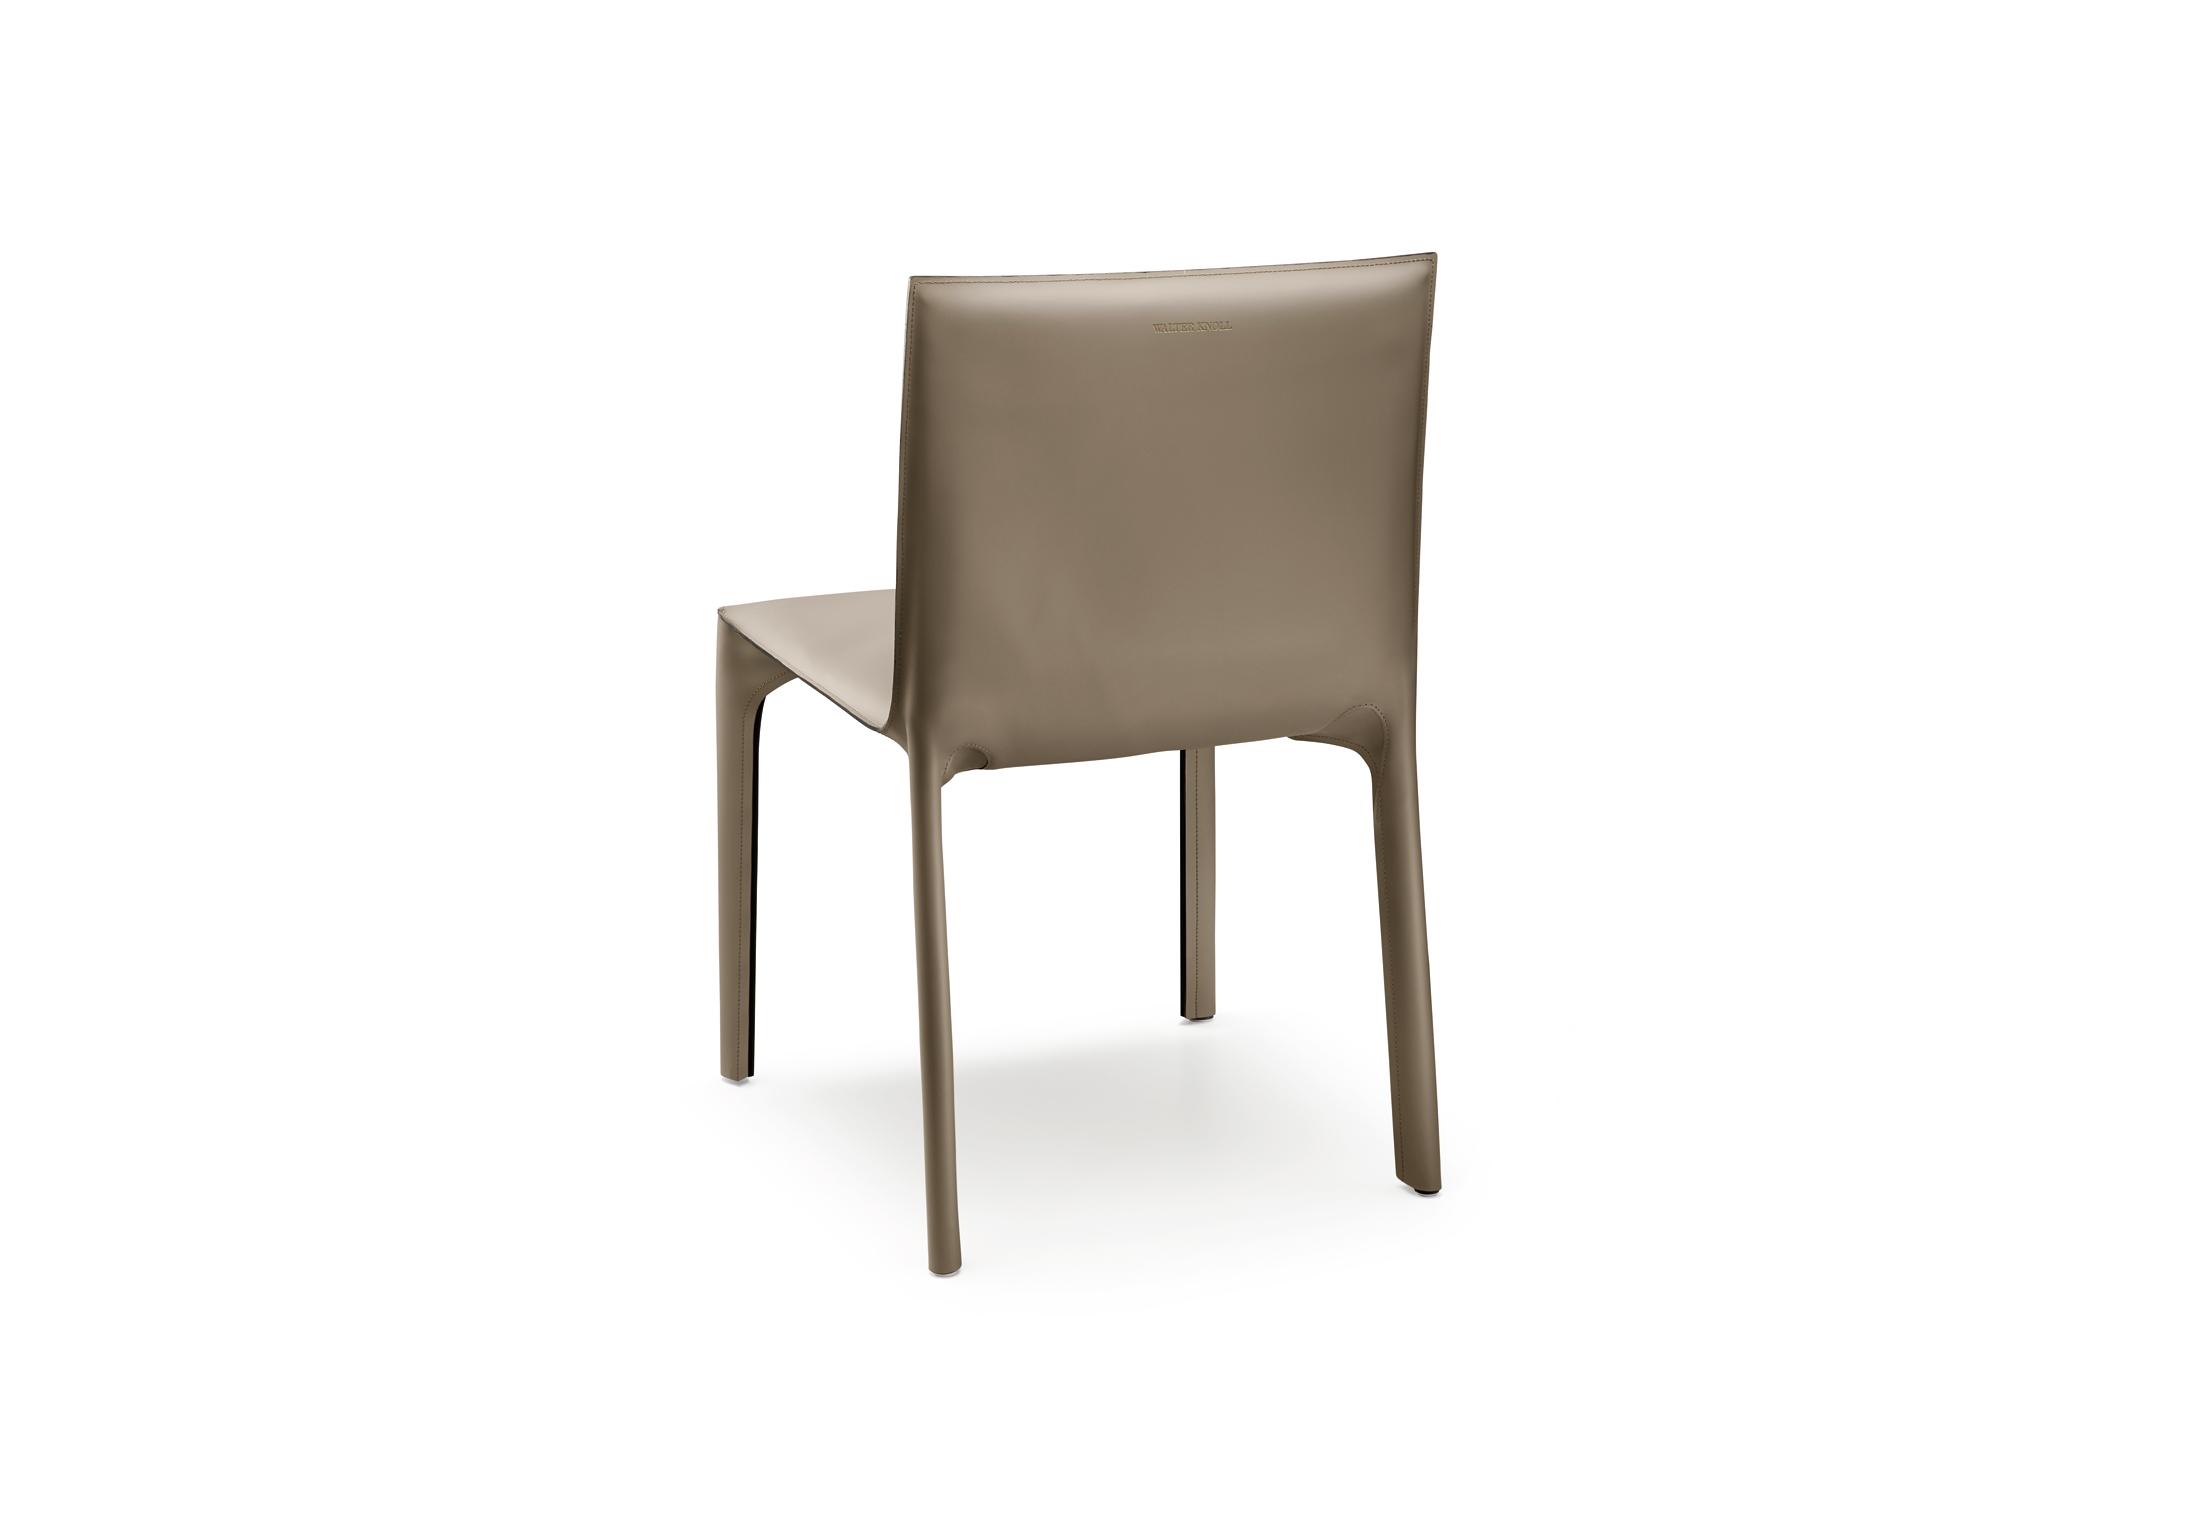 saddle chair von walter knoll stylepark. Black Bedroom Furniture Sets. Home Design Ideas